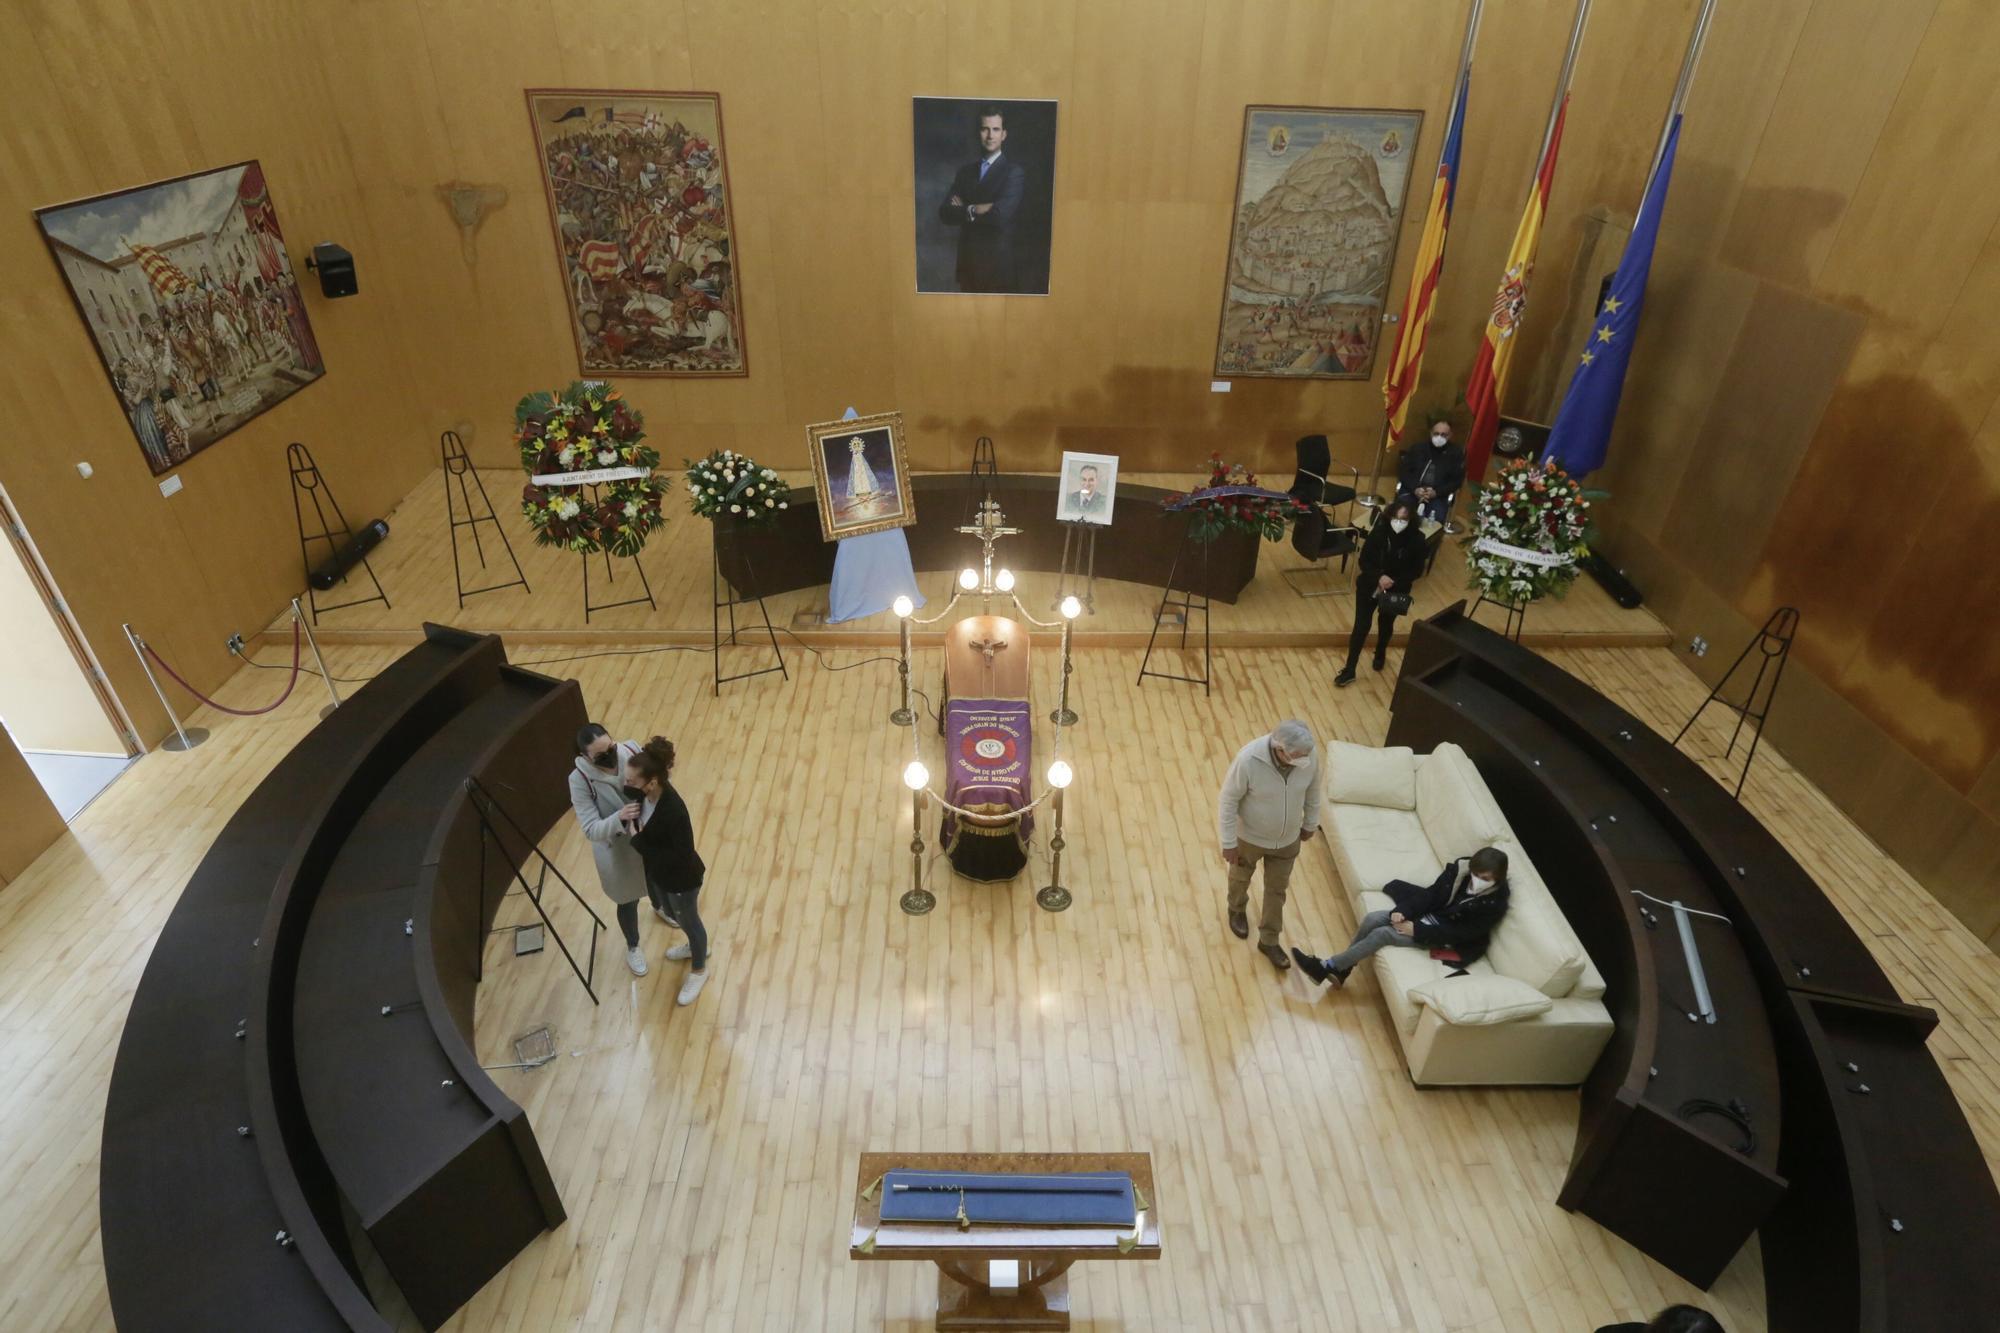 Apertura de la capilla ardiente de Agustín Navarro